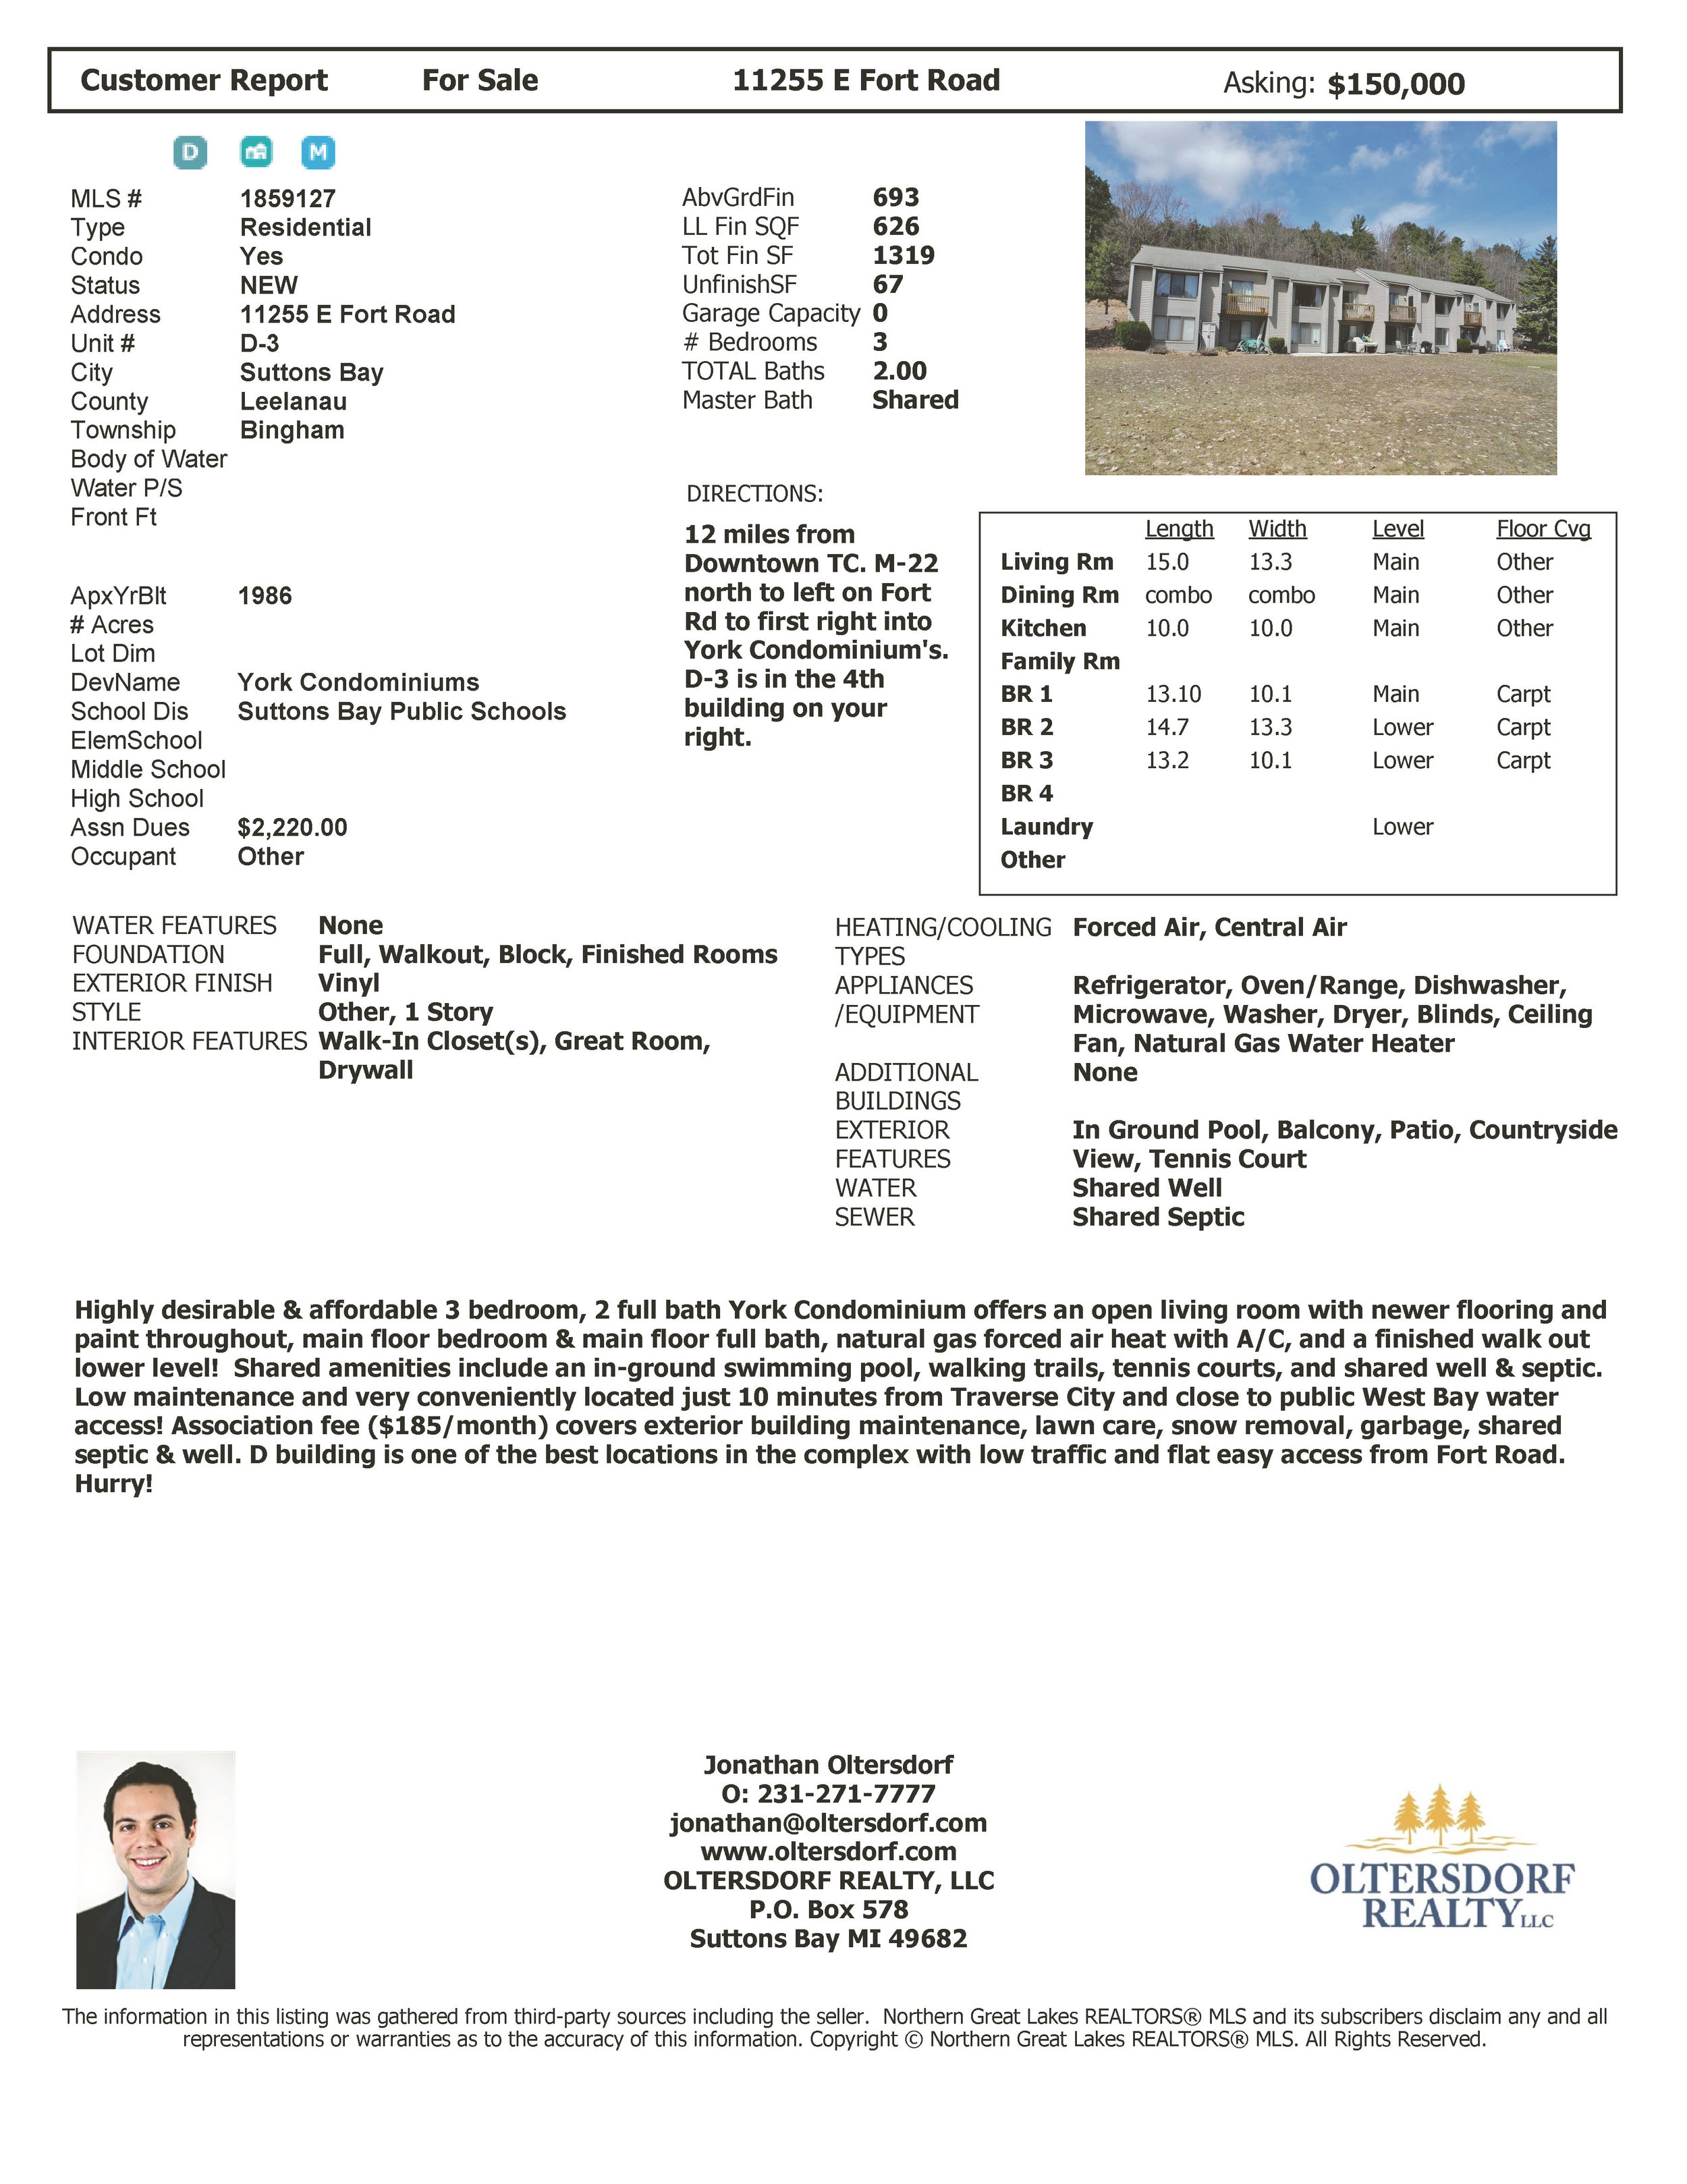 11255 E Fort Road, Unit D-3, Suttons Bay, MI – 3 Bedroom, 2 Bath York Condominium 2019.jpg